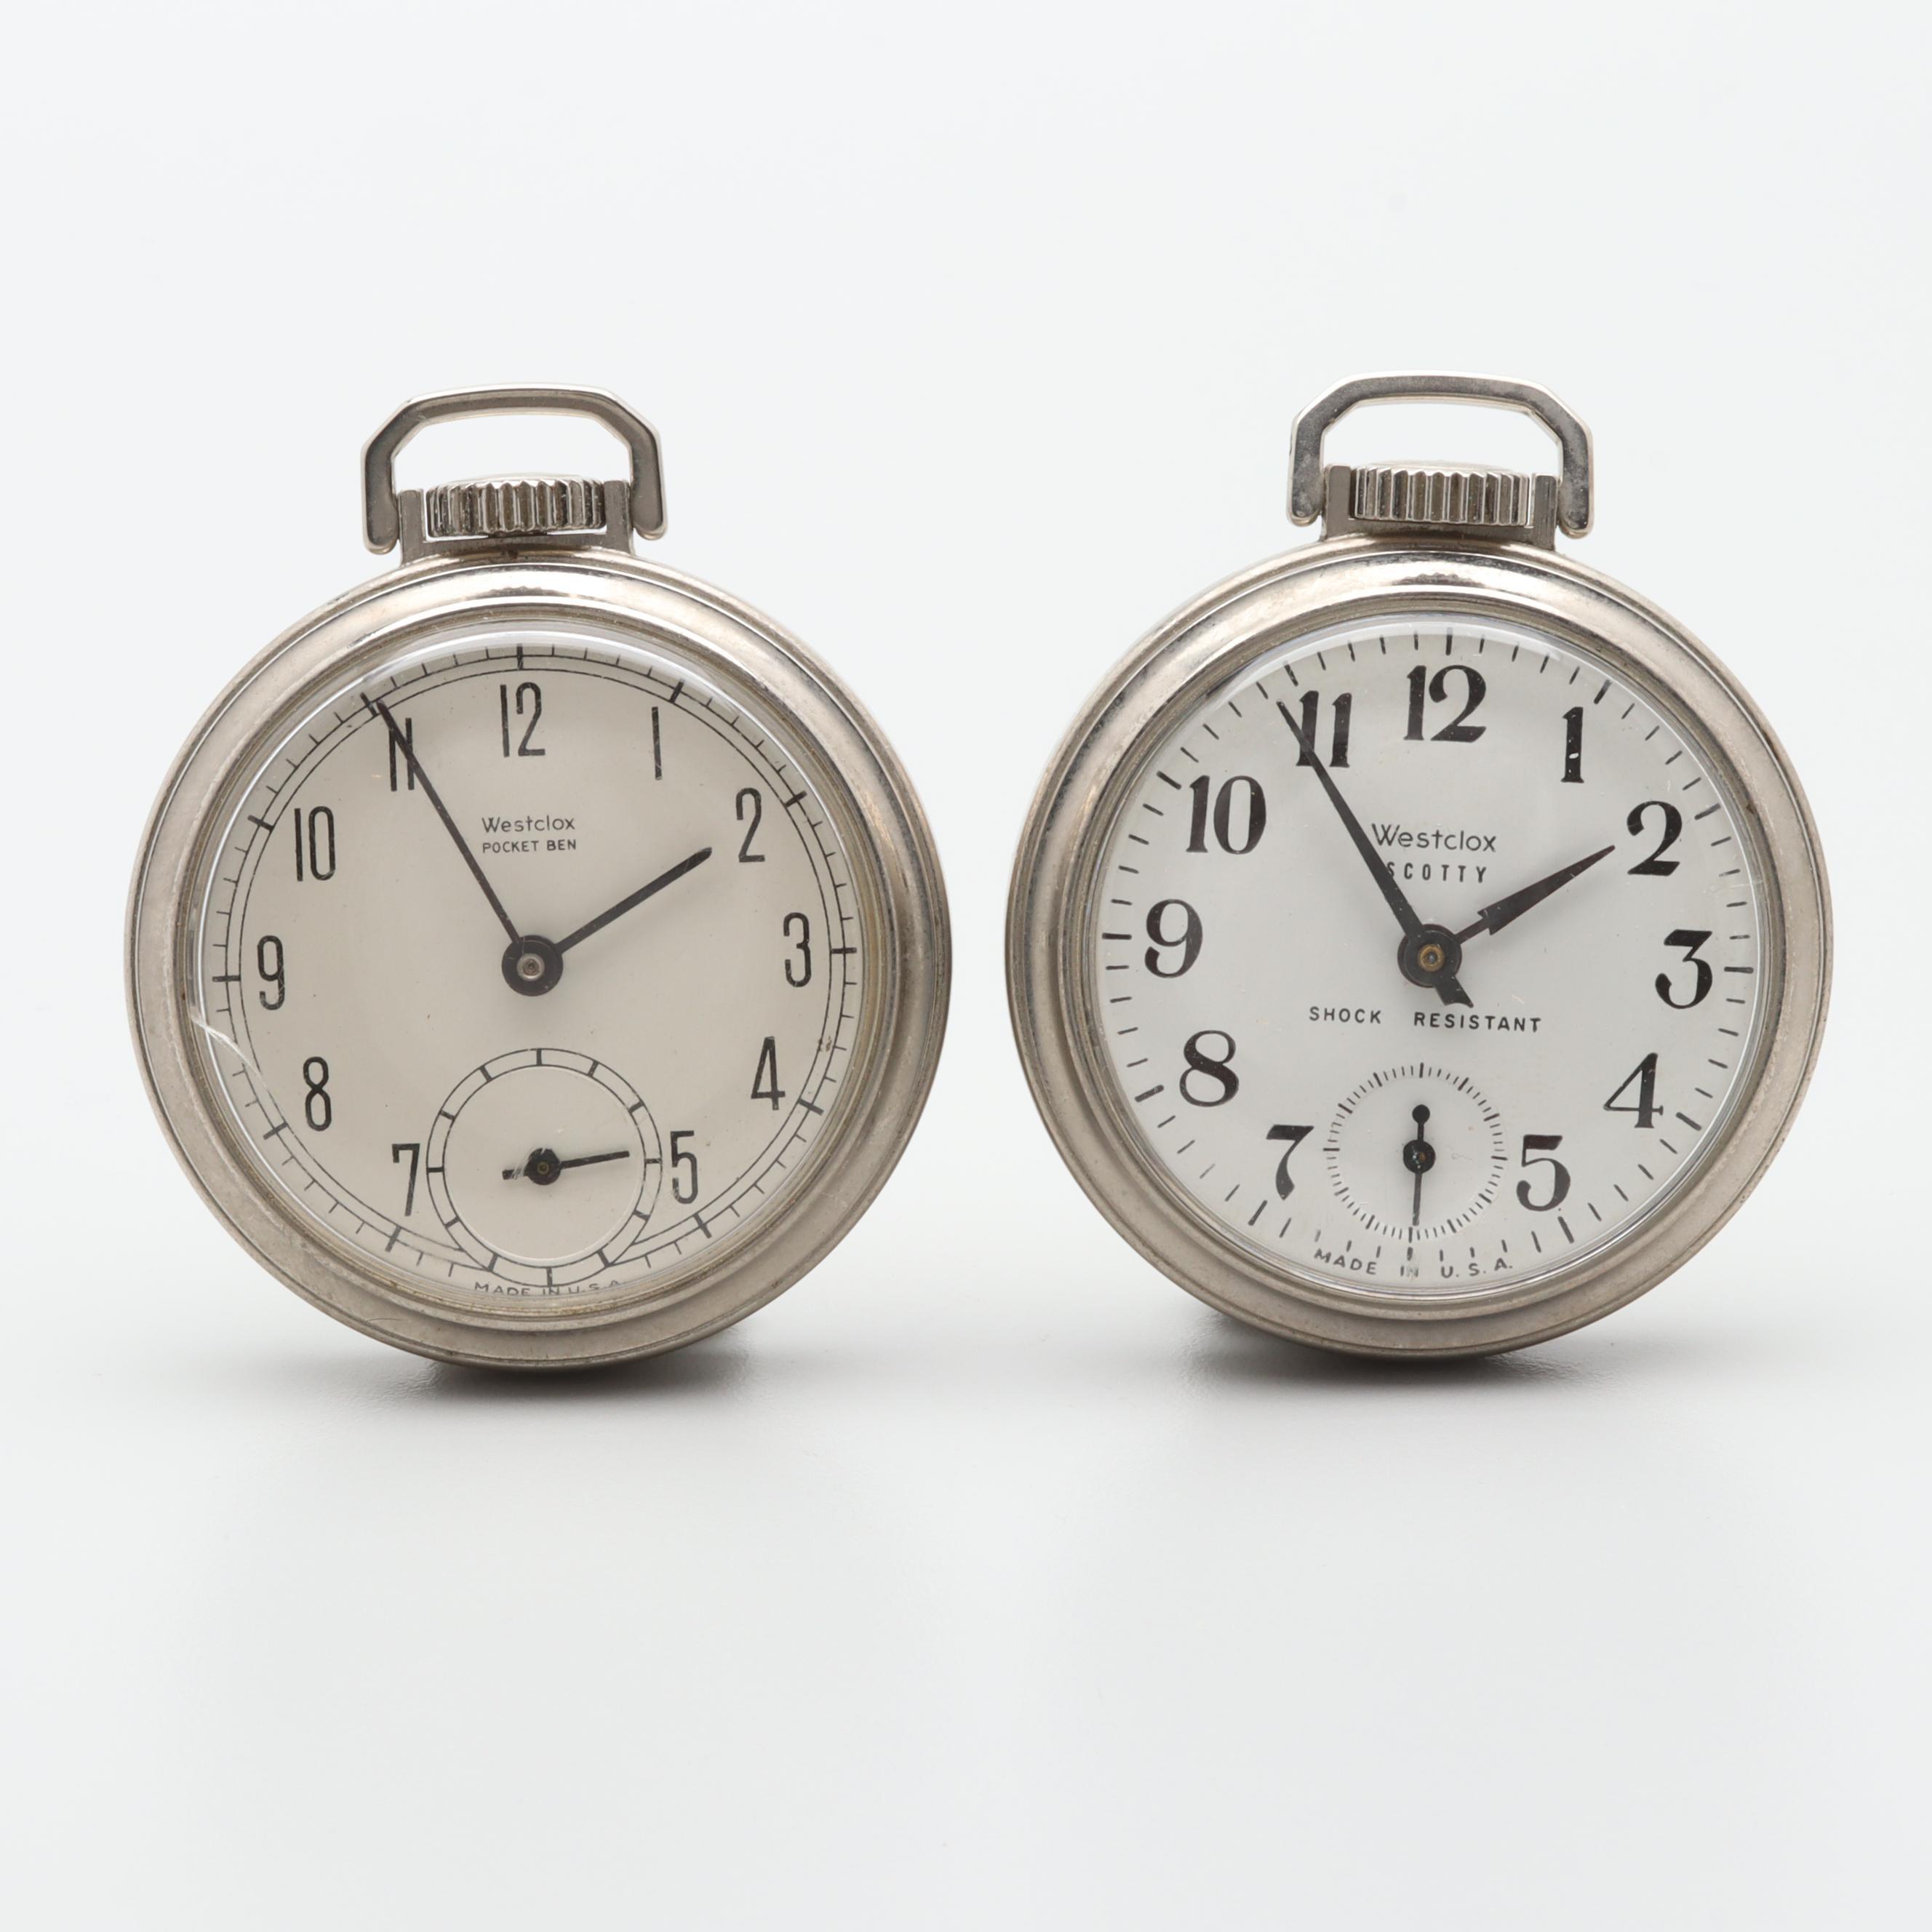 Westclox Silver Tone Open Face Pocket Watch Selection